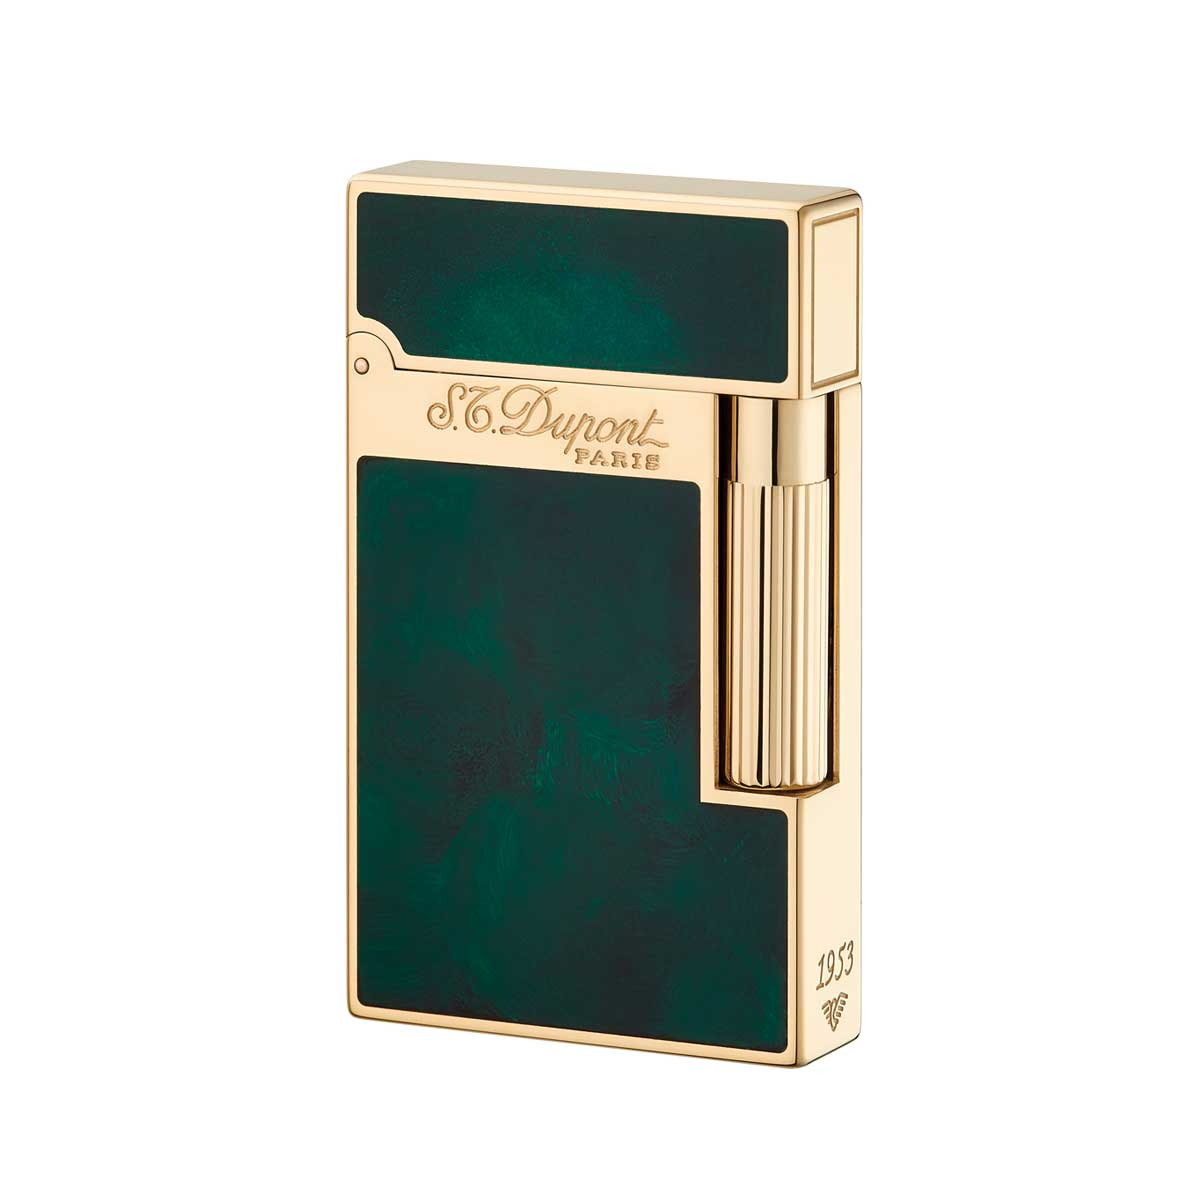 St Dupont Ligne 2 Atelier Lighter Emerald Green Chinese